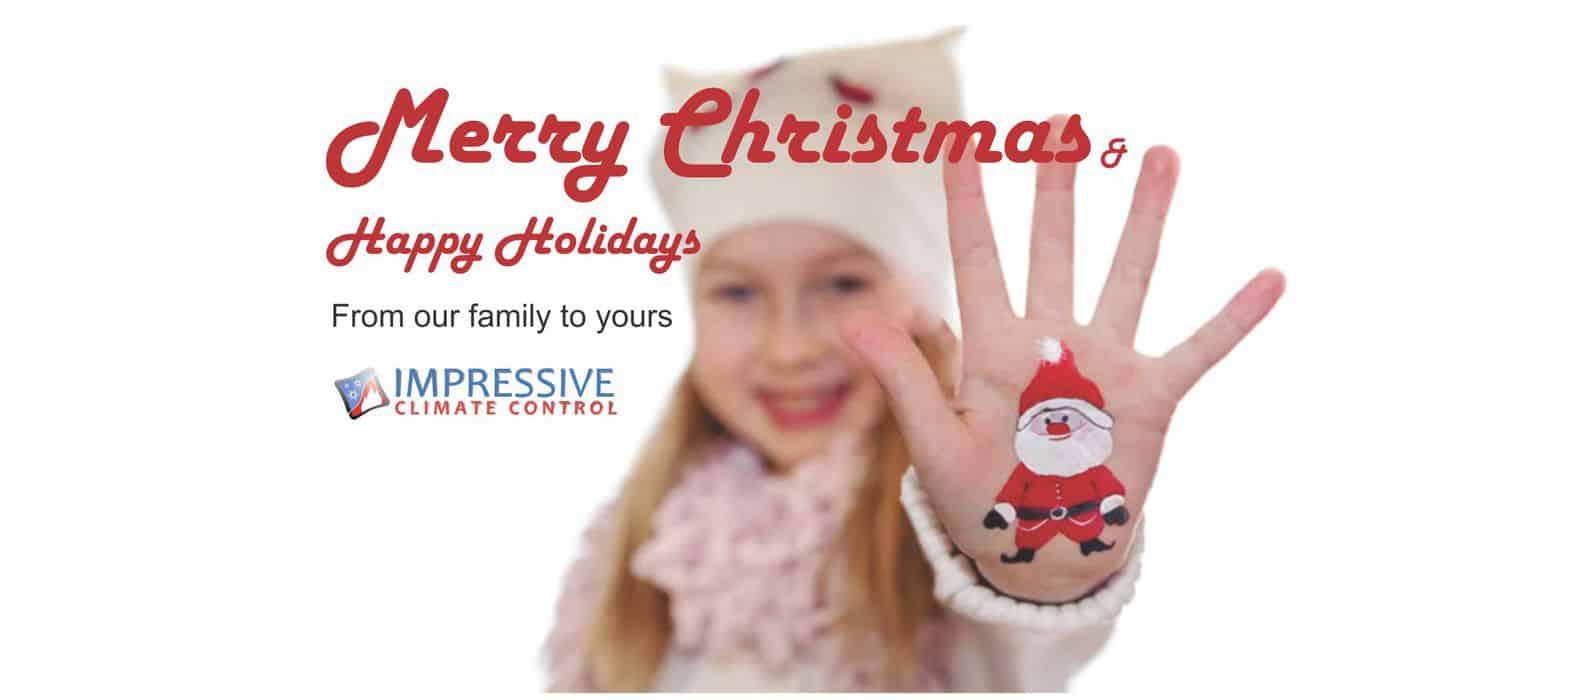 Christmas-Greetings-Impressive-Climate-Control-Ottawa-2151x951